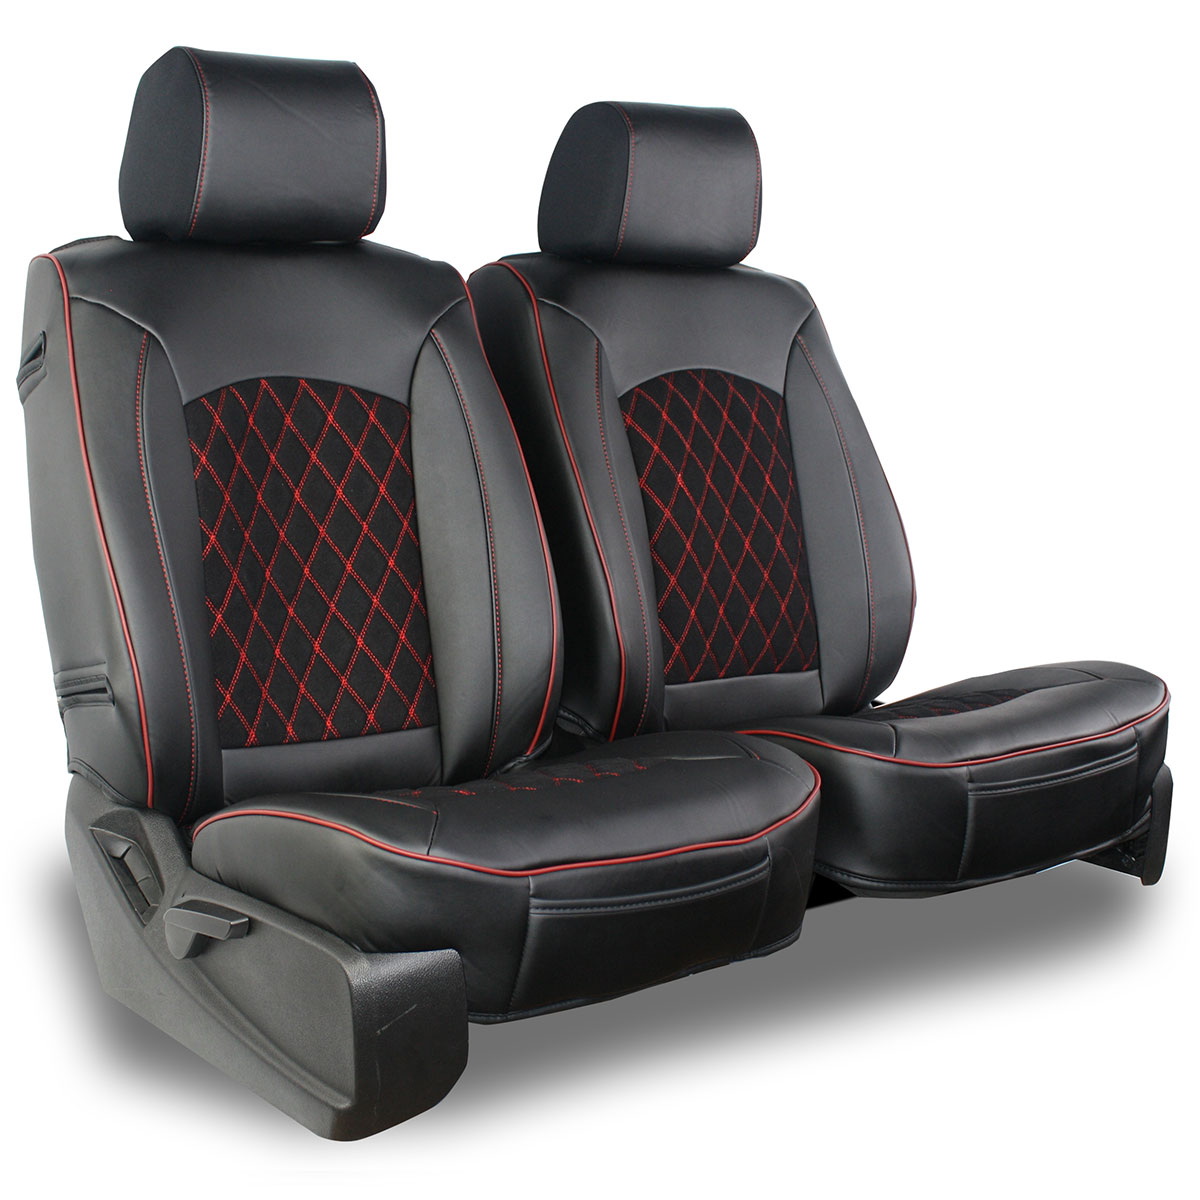 Semi Custom Leatherette Suede Diamond Seat Covers Premium Quality